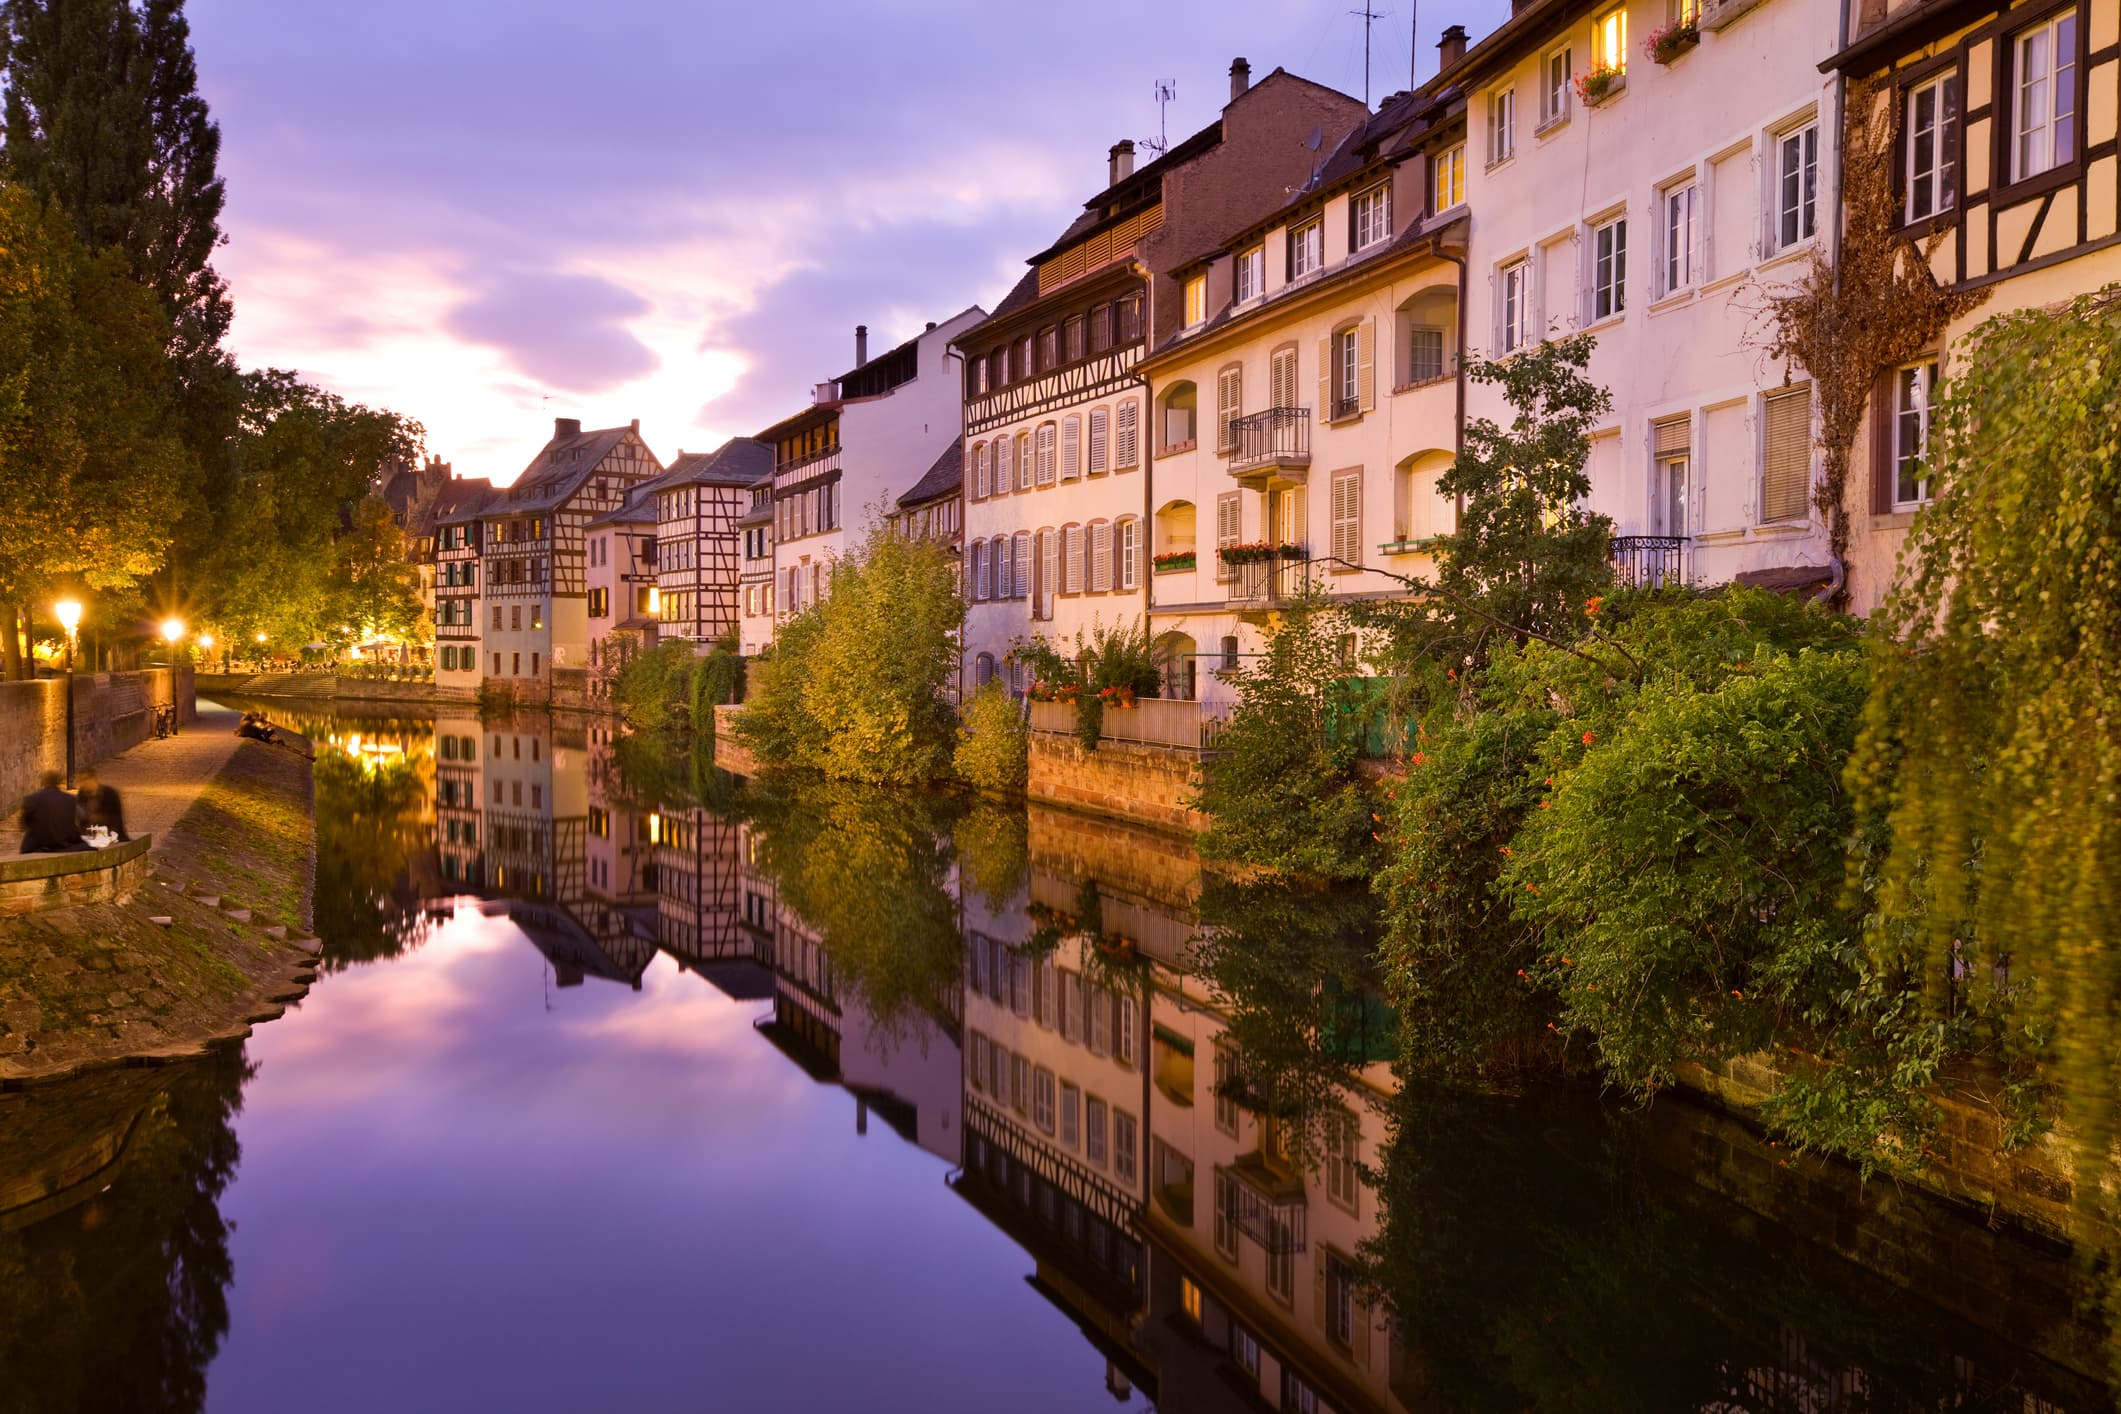 Rues Strasbourg Nuit